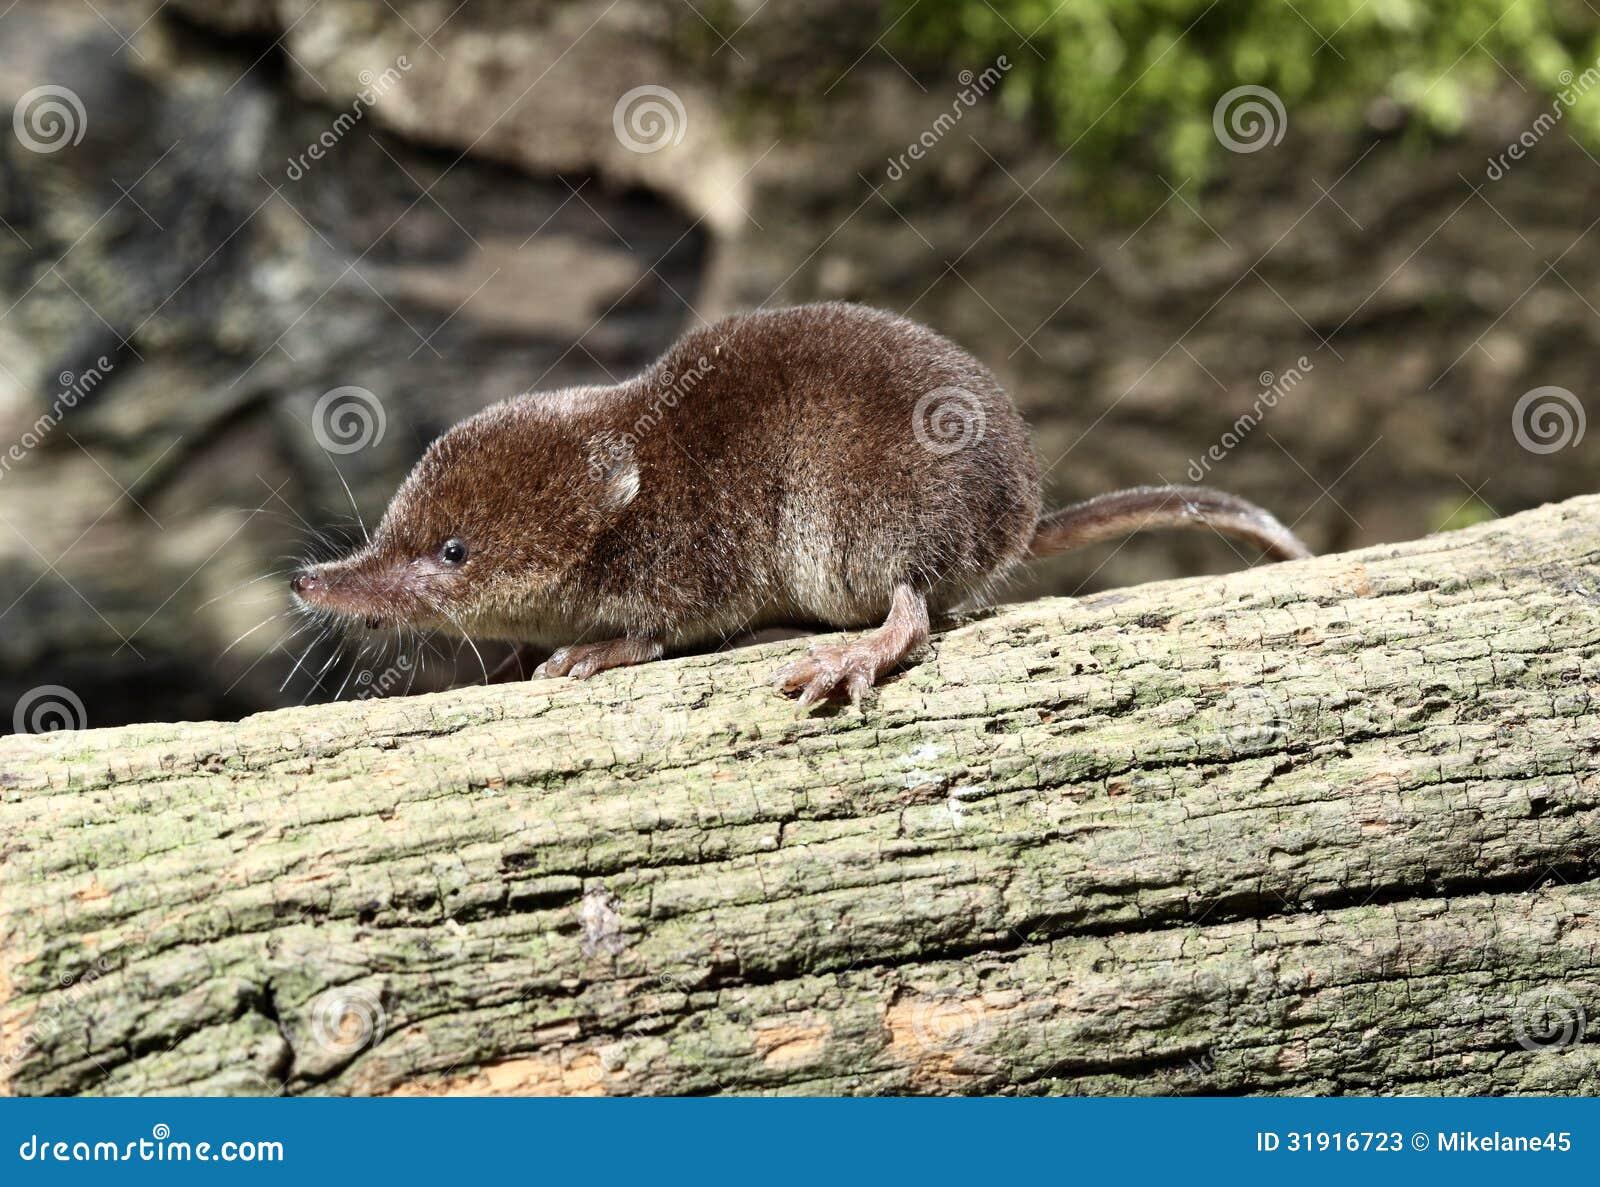 Related Keywords & Suggestions for sorex araneus Shrew Predators